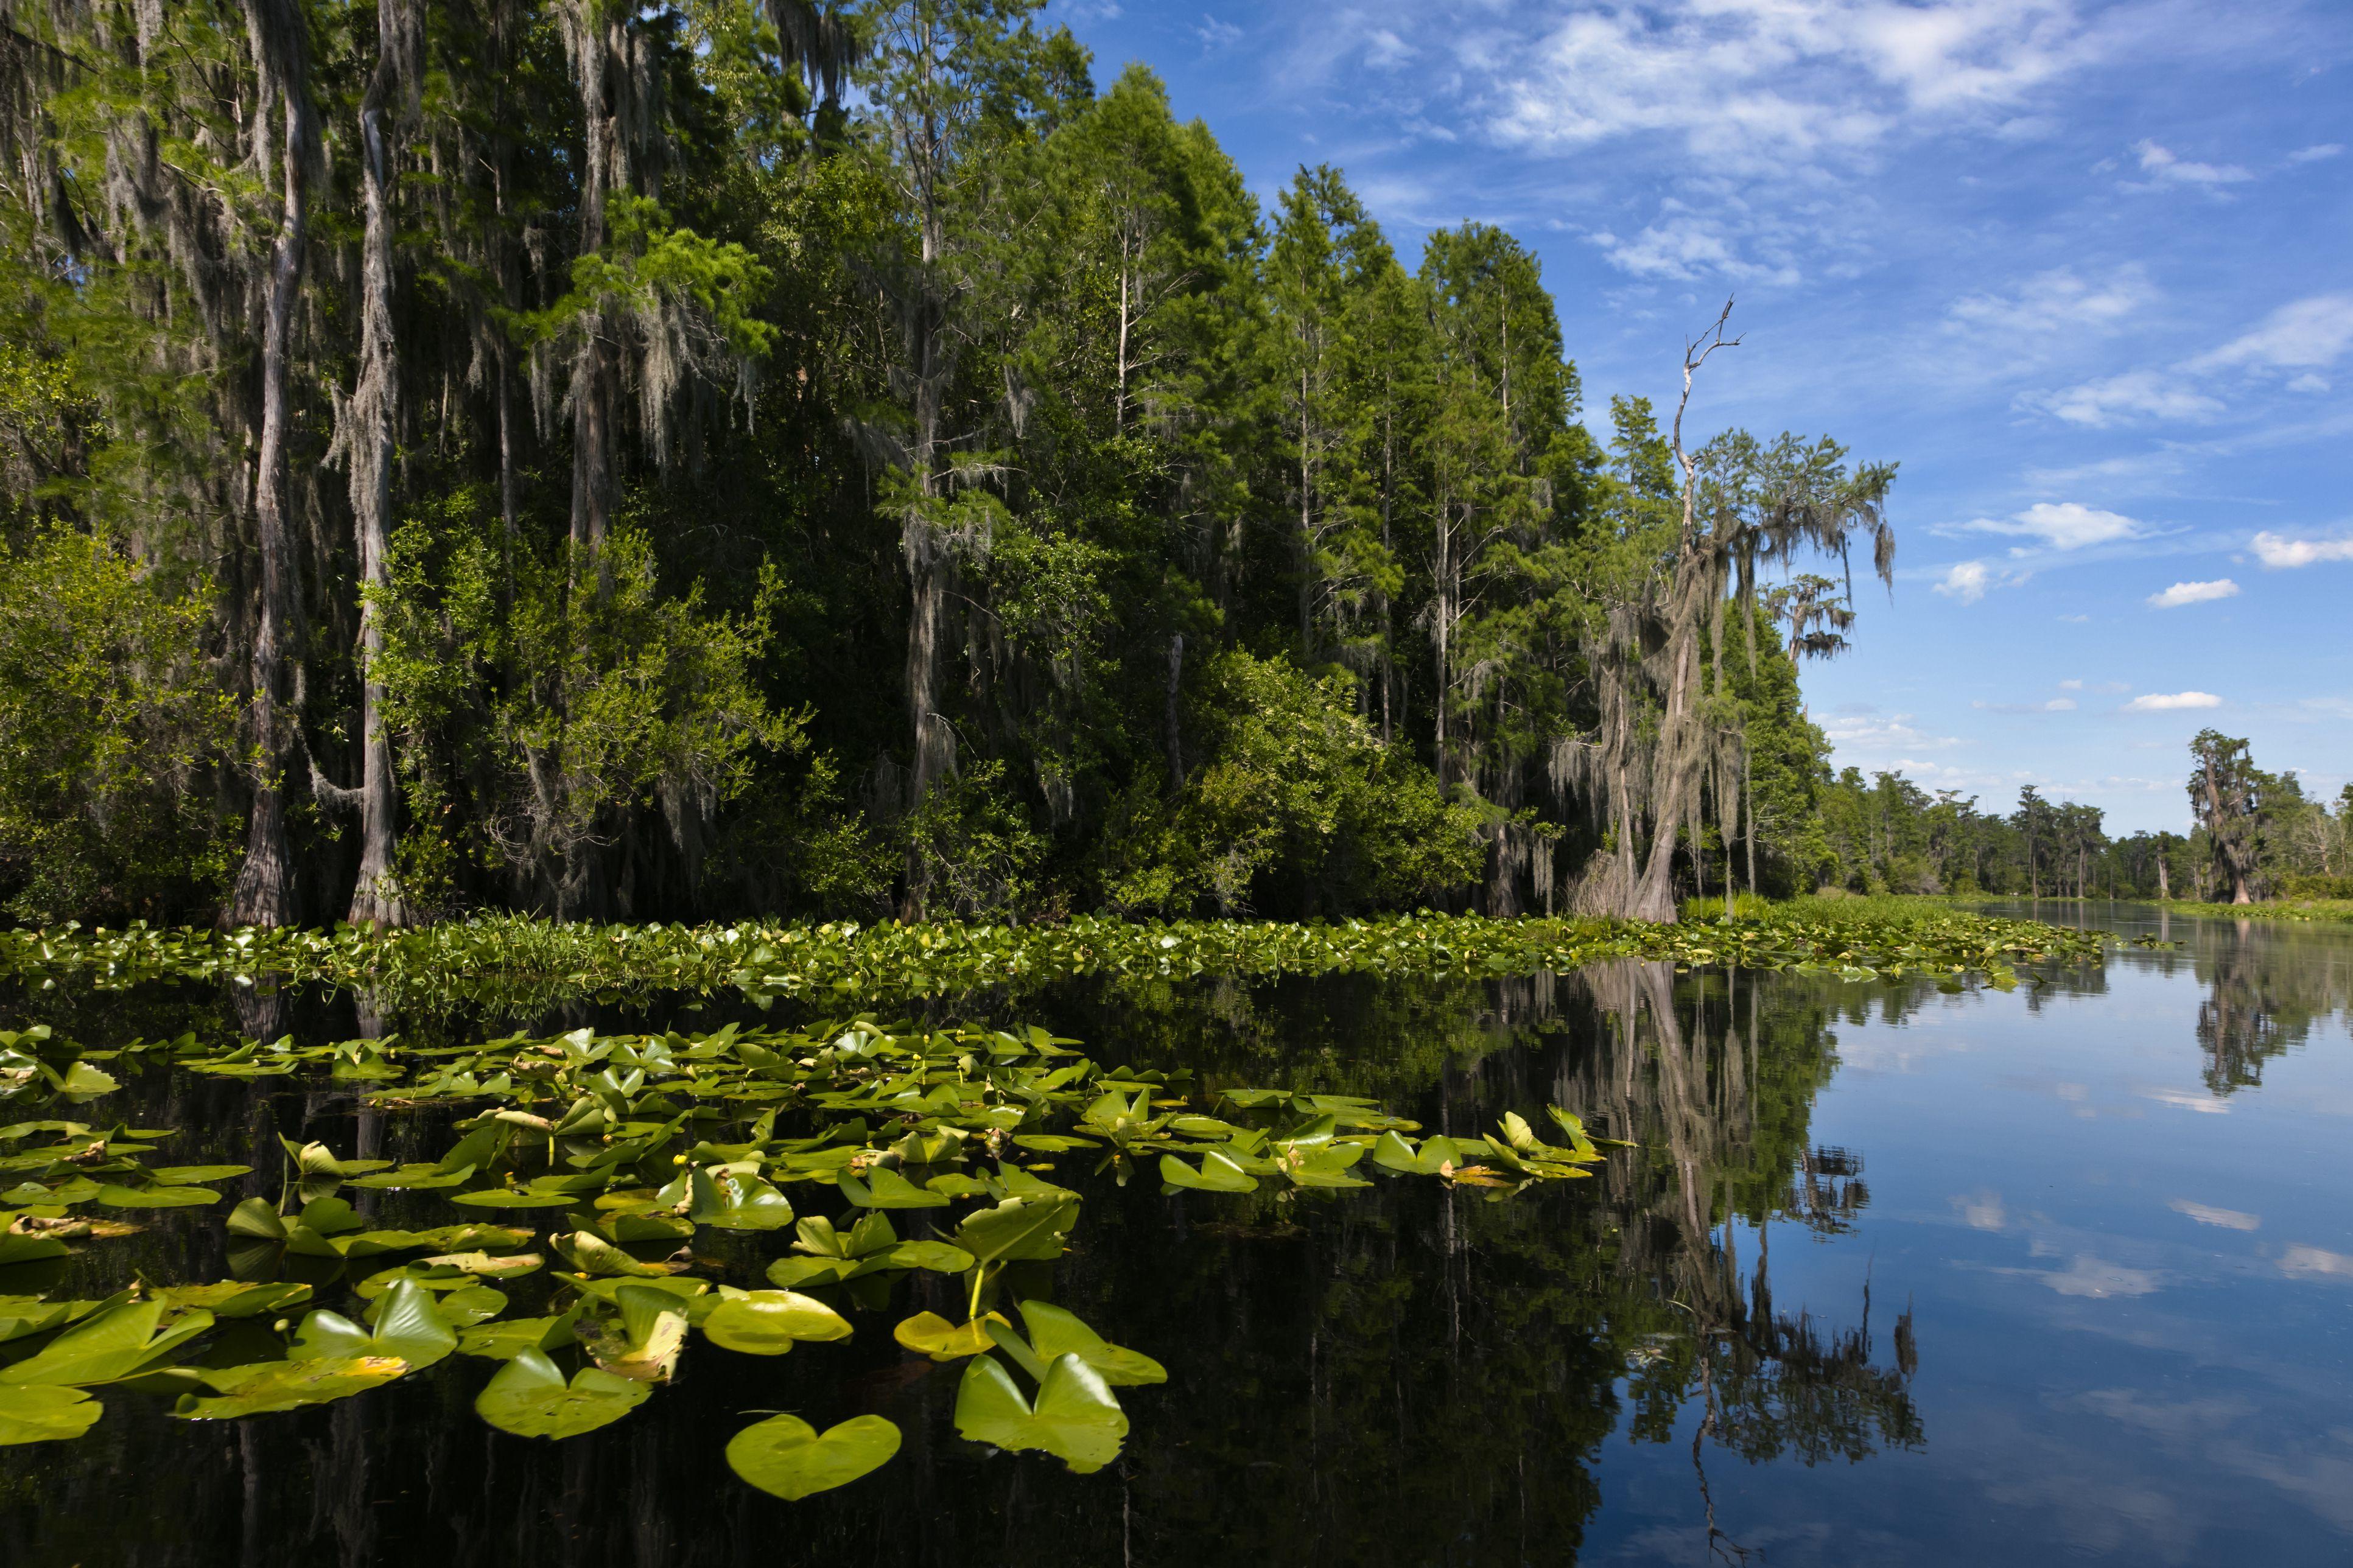 Okefenokee Swamp - Florida